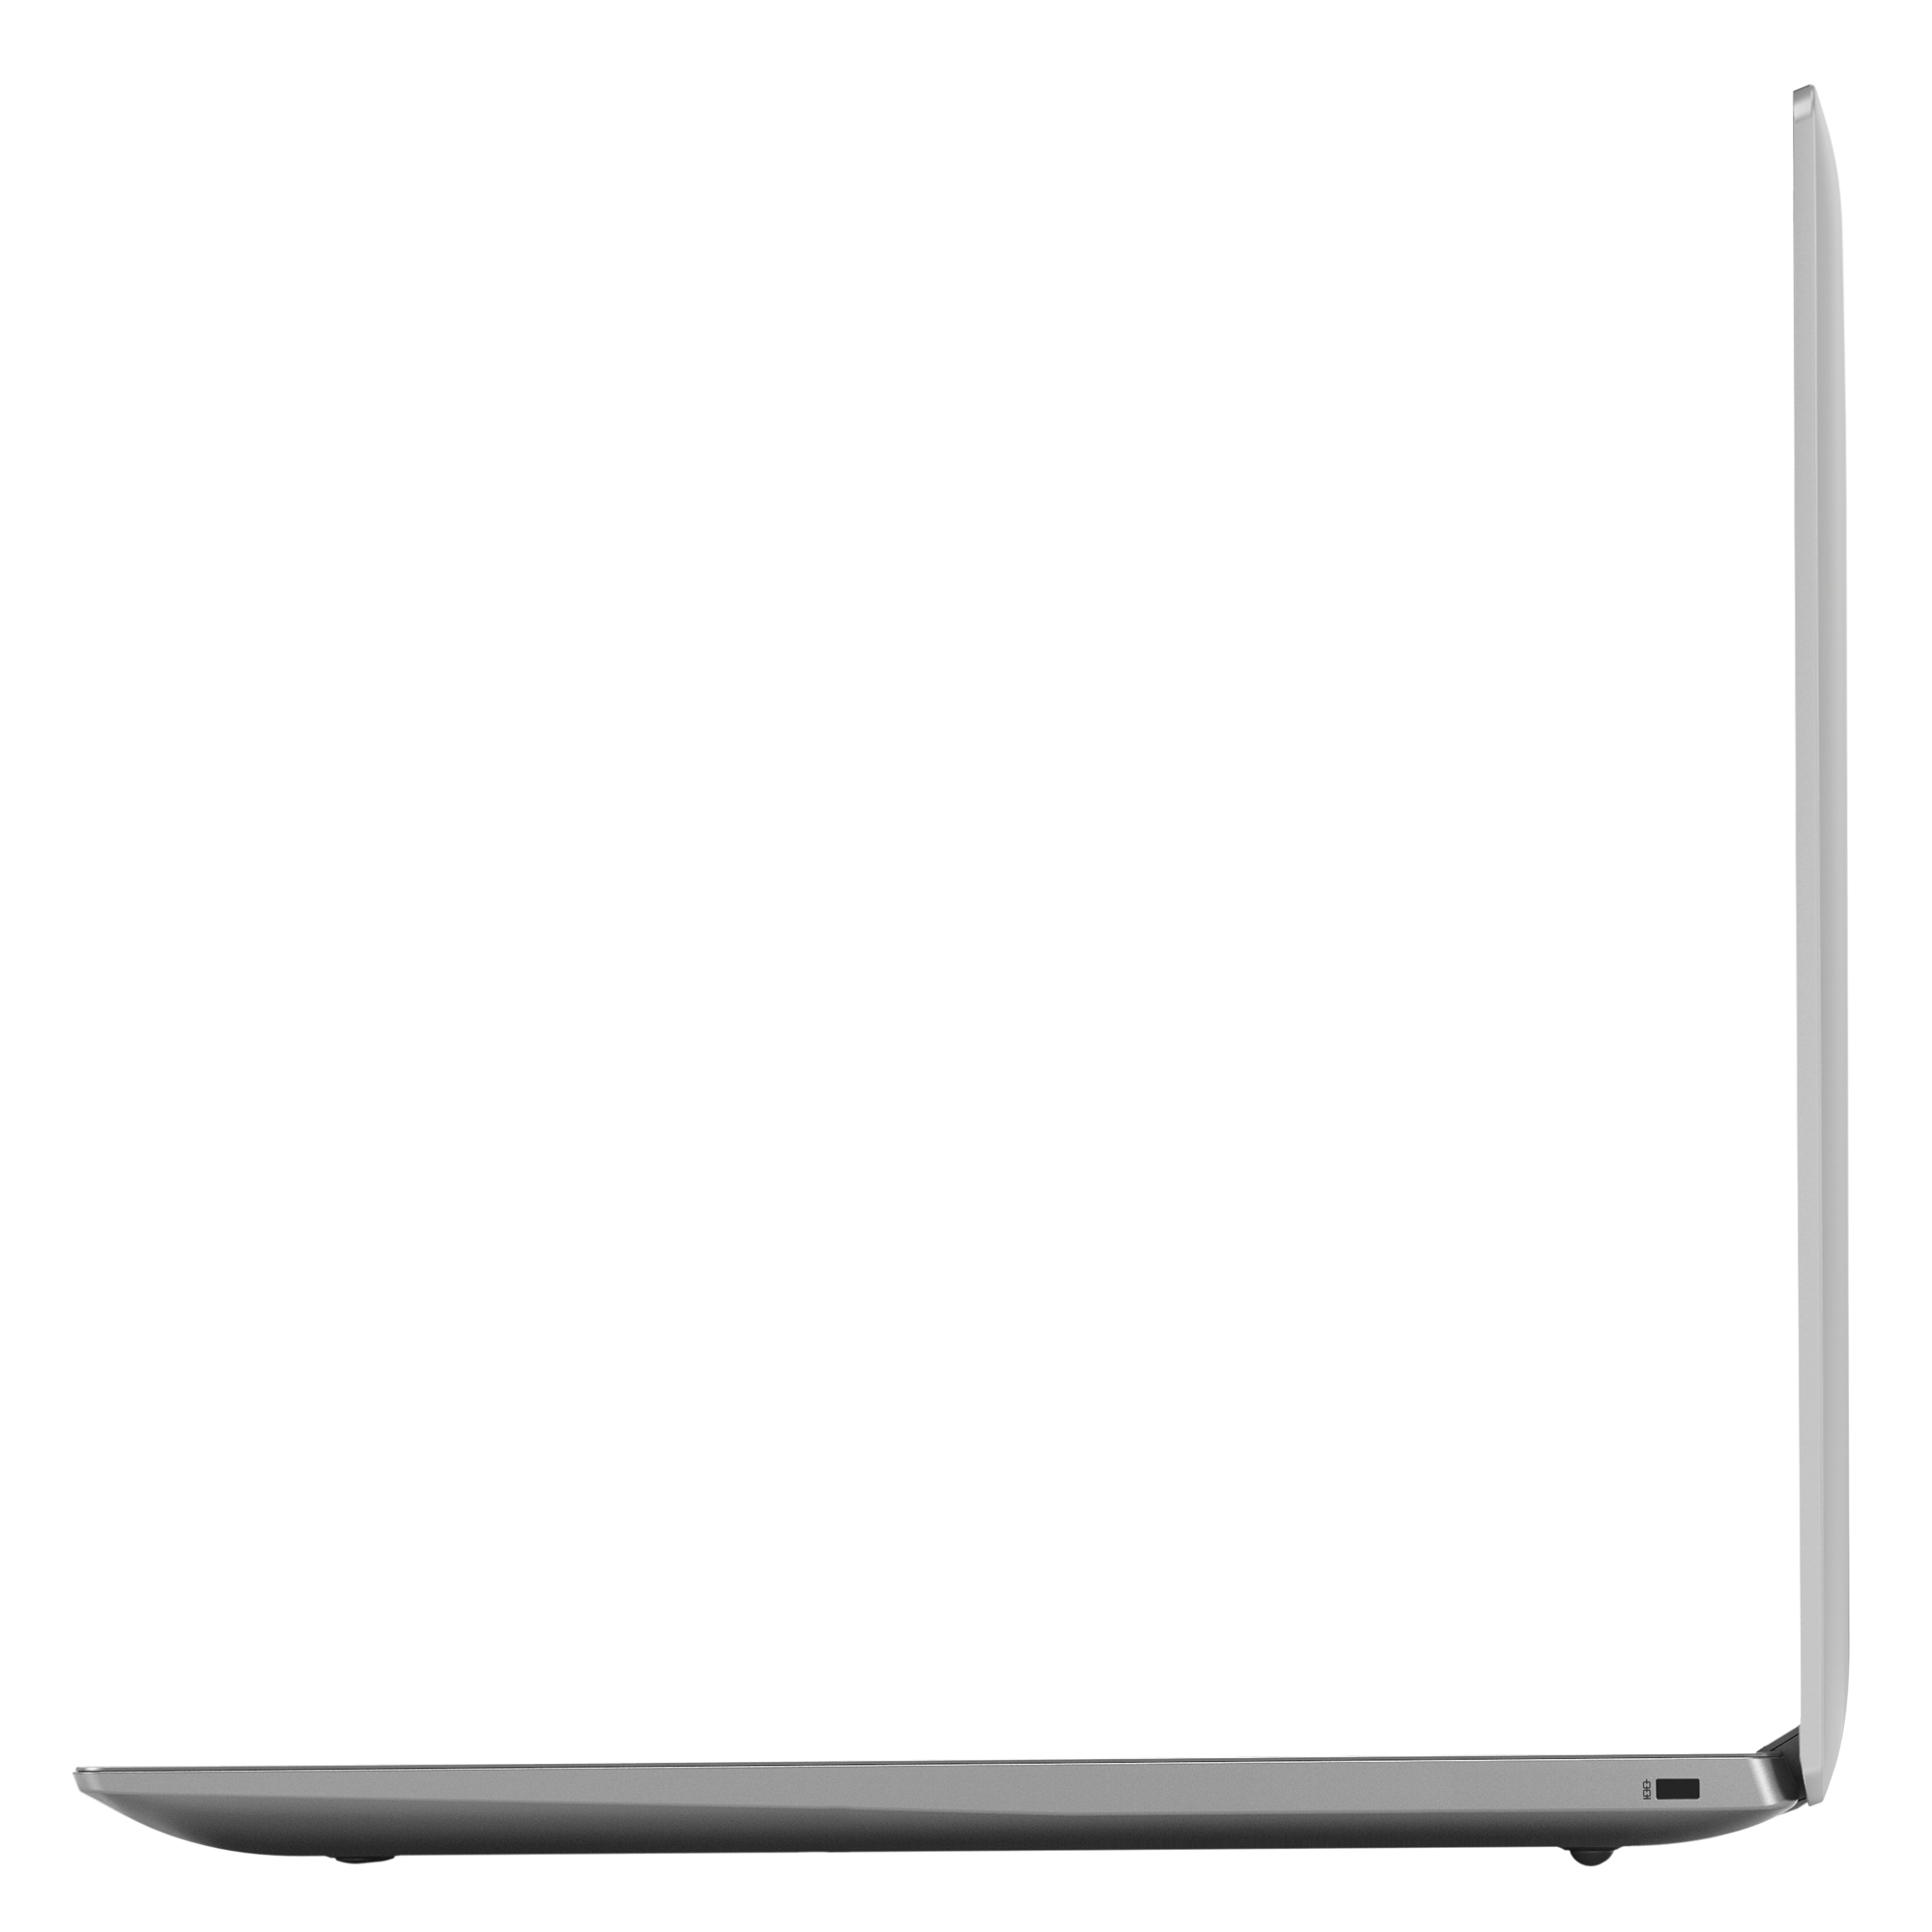 Фото  Ноутбук Lenovo ideapad 330-17IKB Platinum Grey (81DM00BURU)